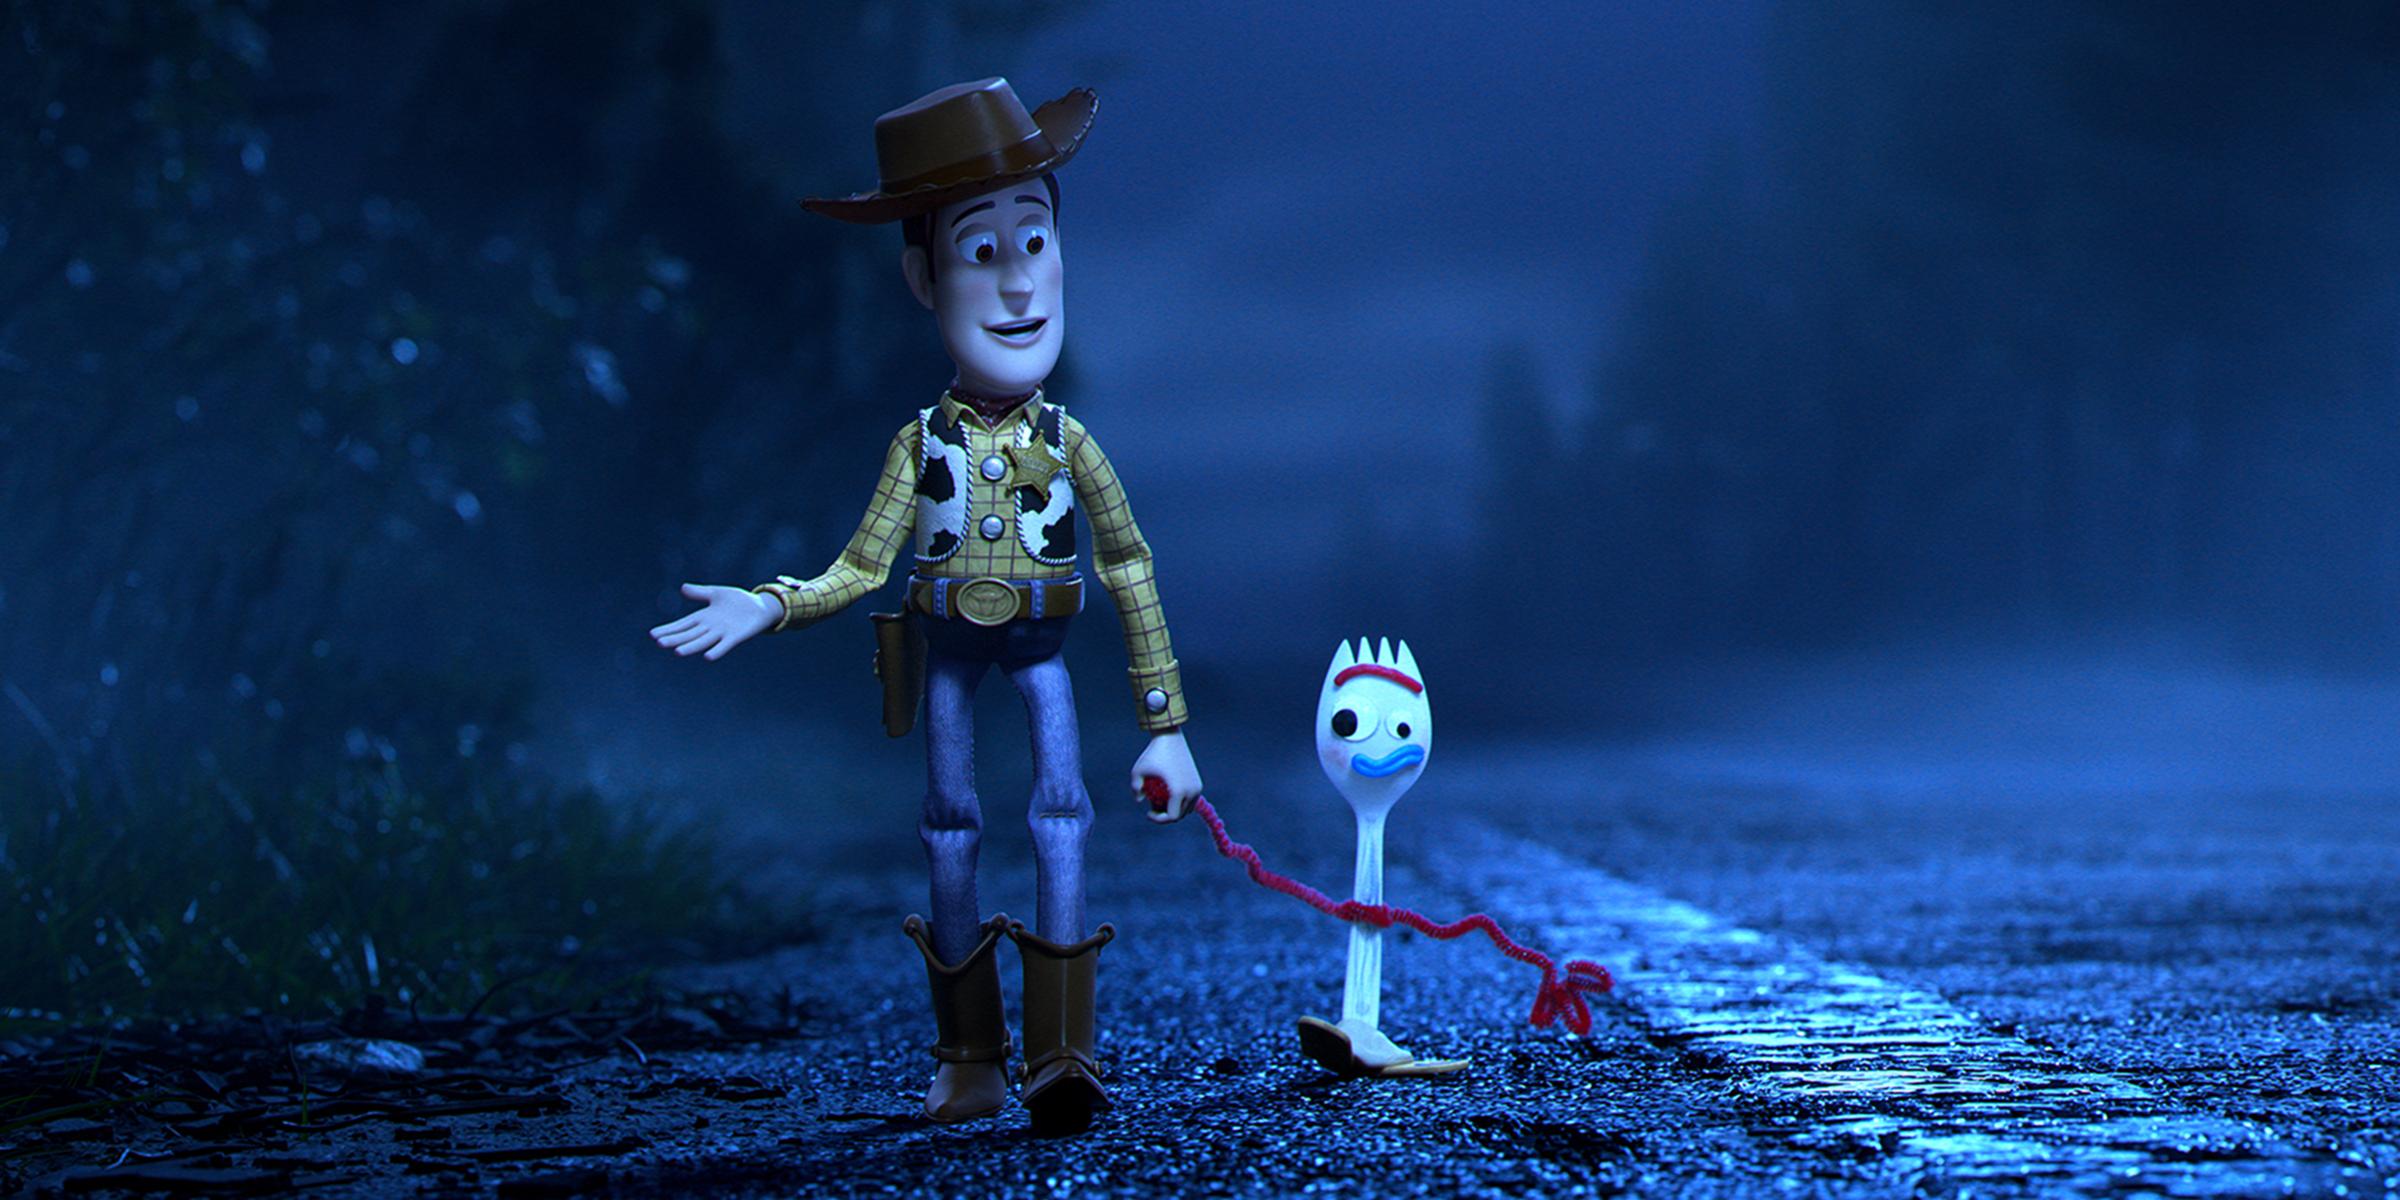 Toy Story 4 abbraccio